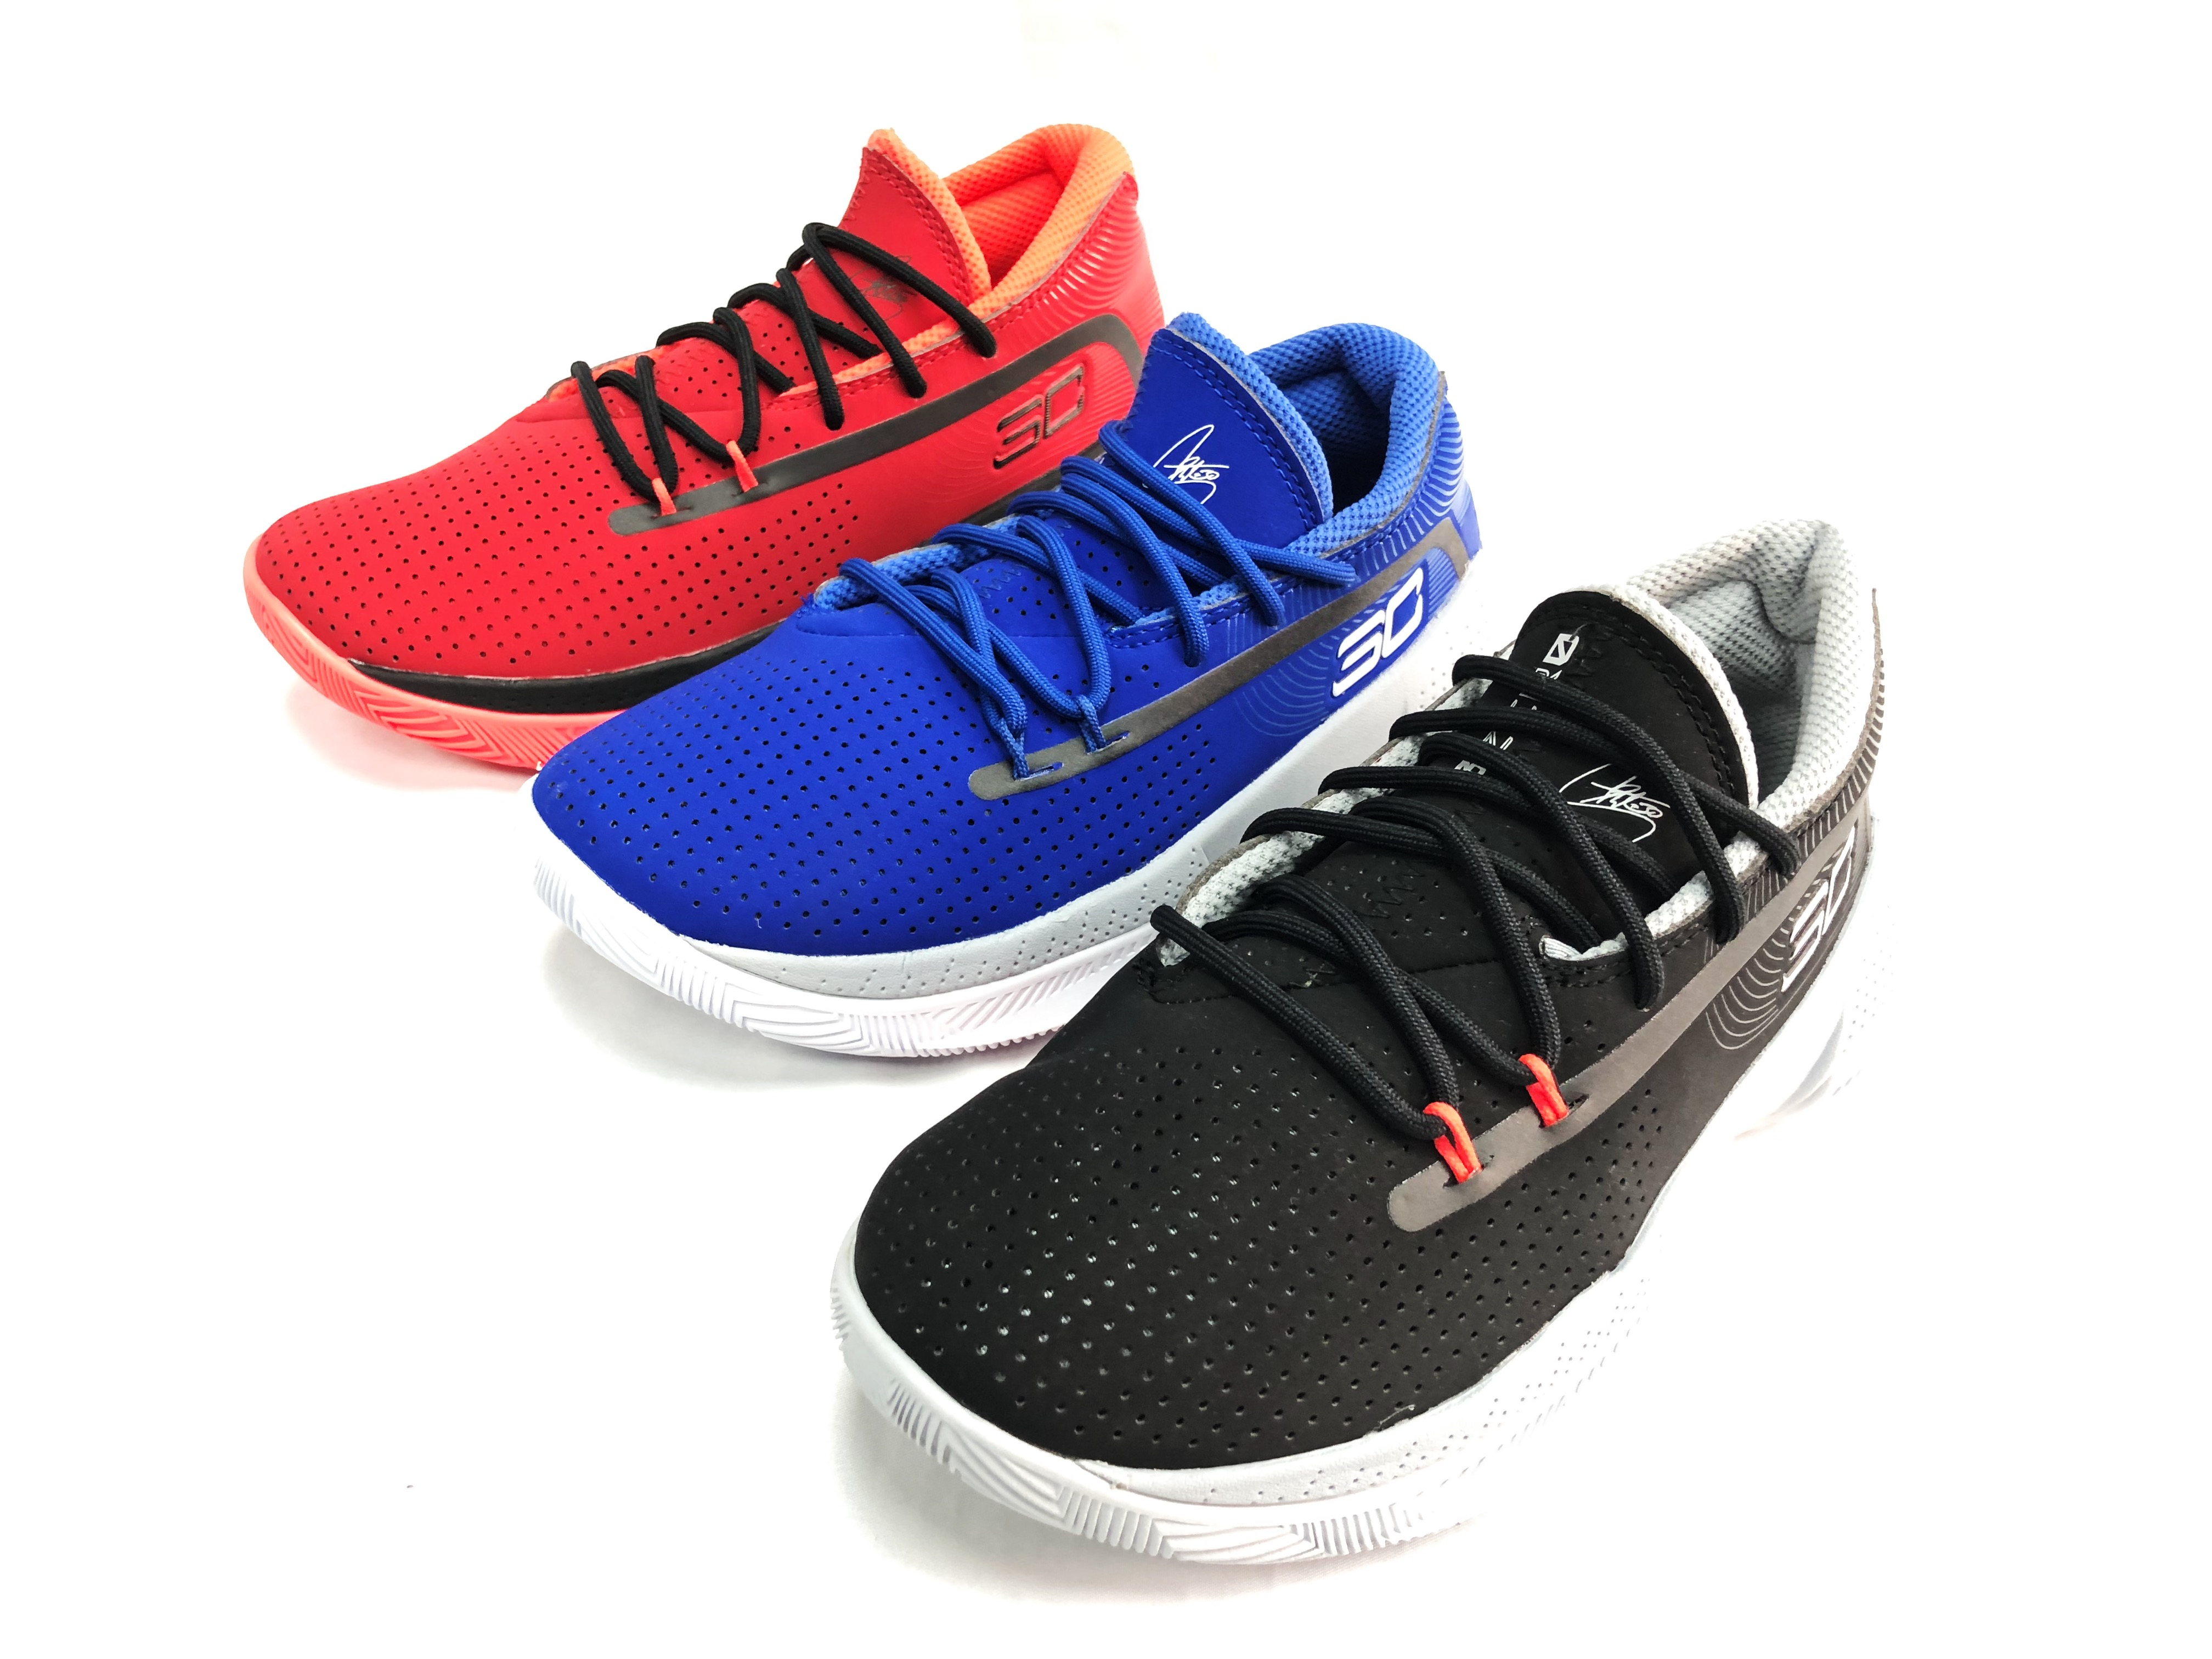 Under Armour SC3Zero Basketball Shoes